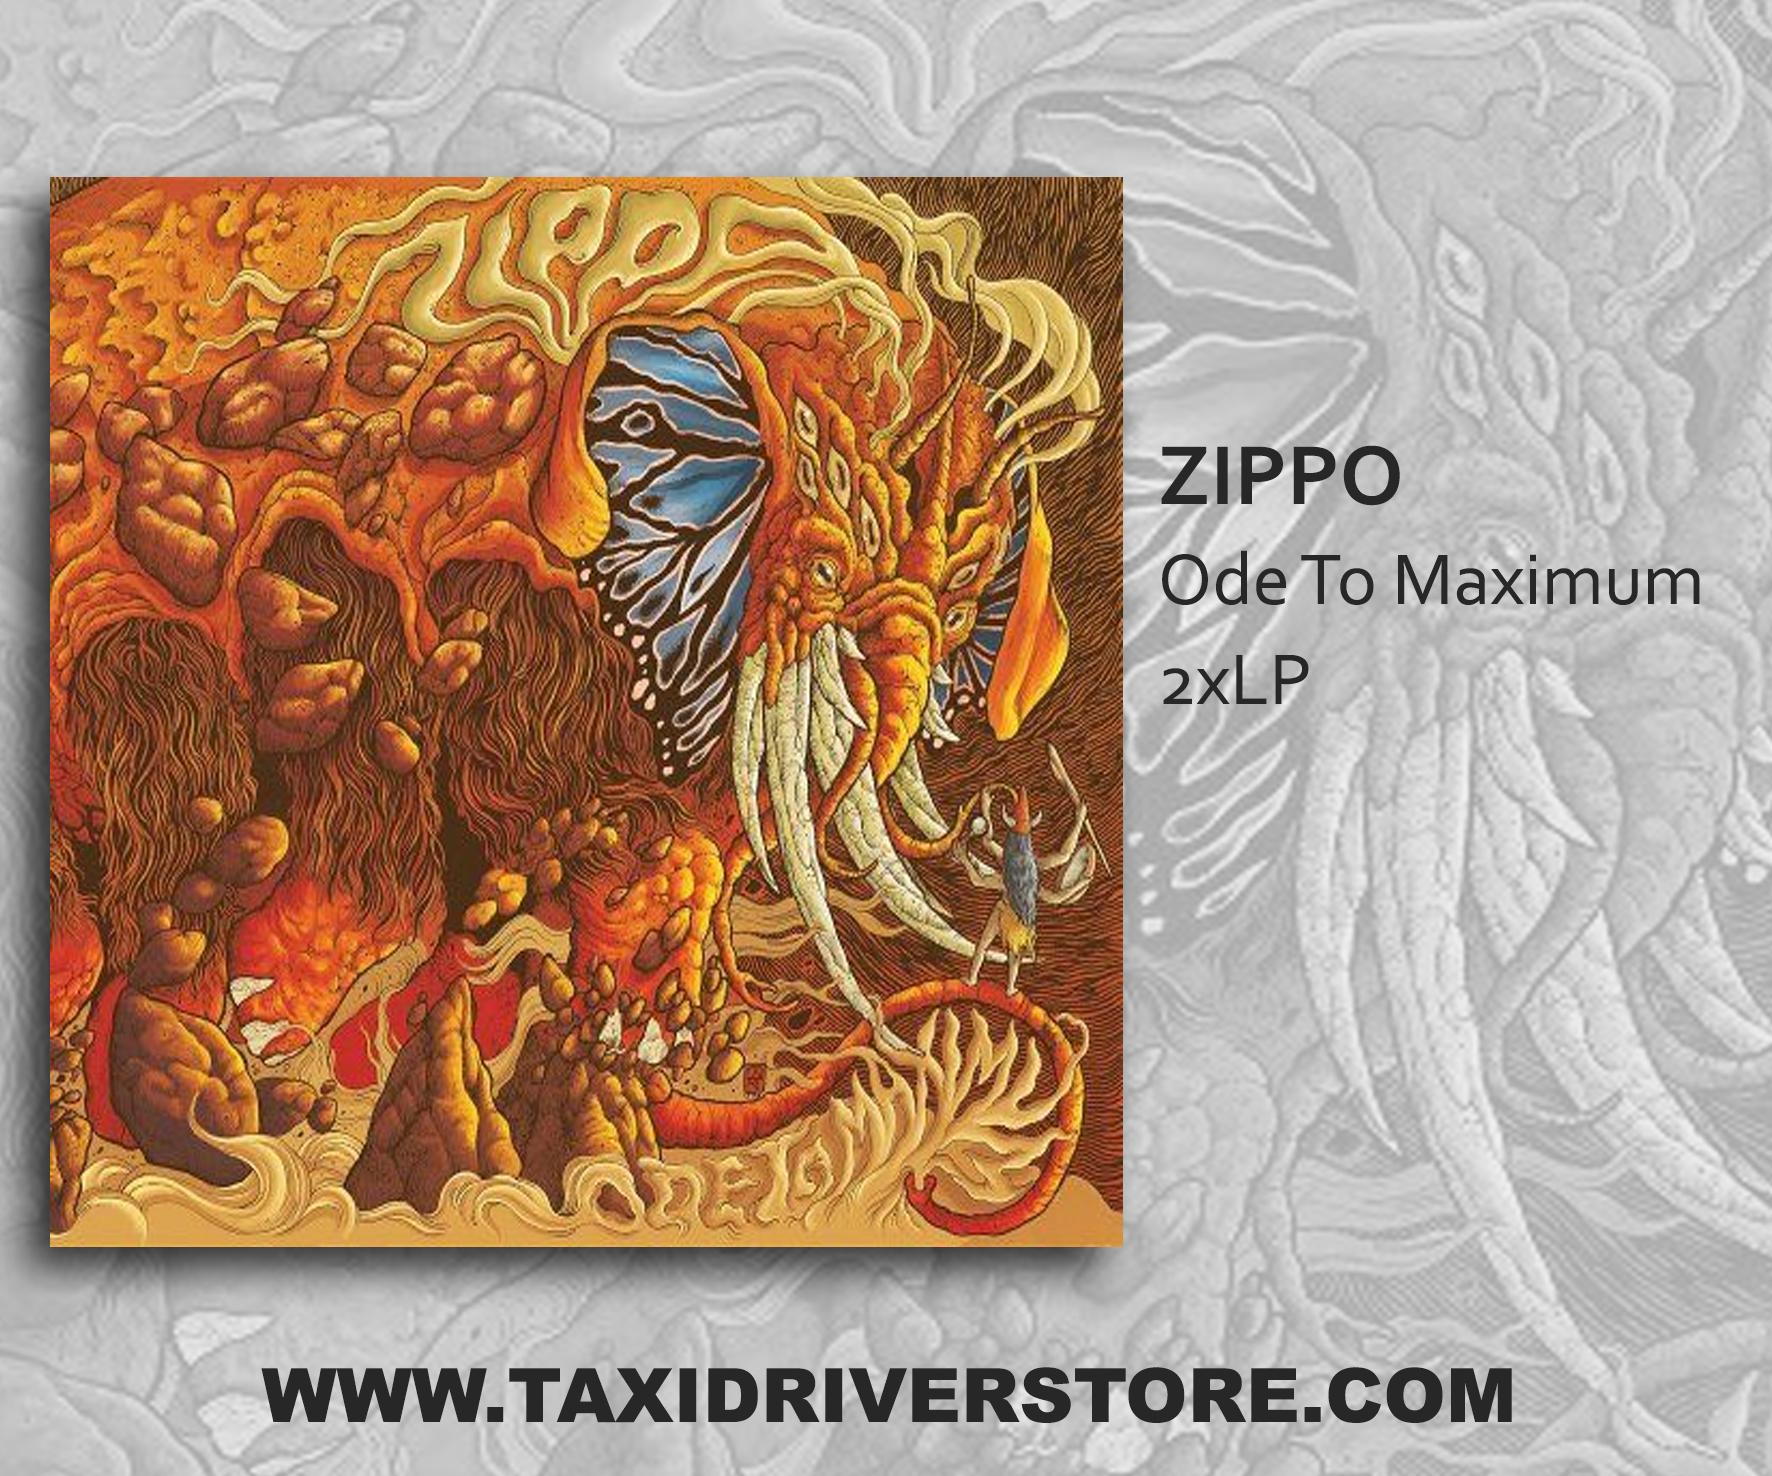 Zippo-Ode-To-Maximum